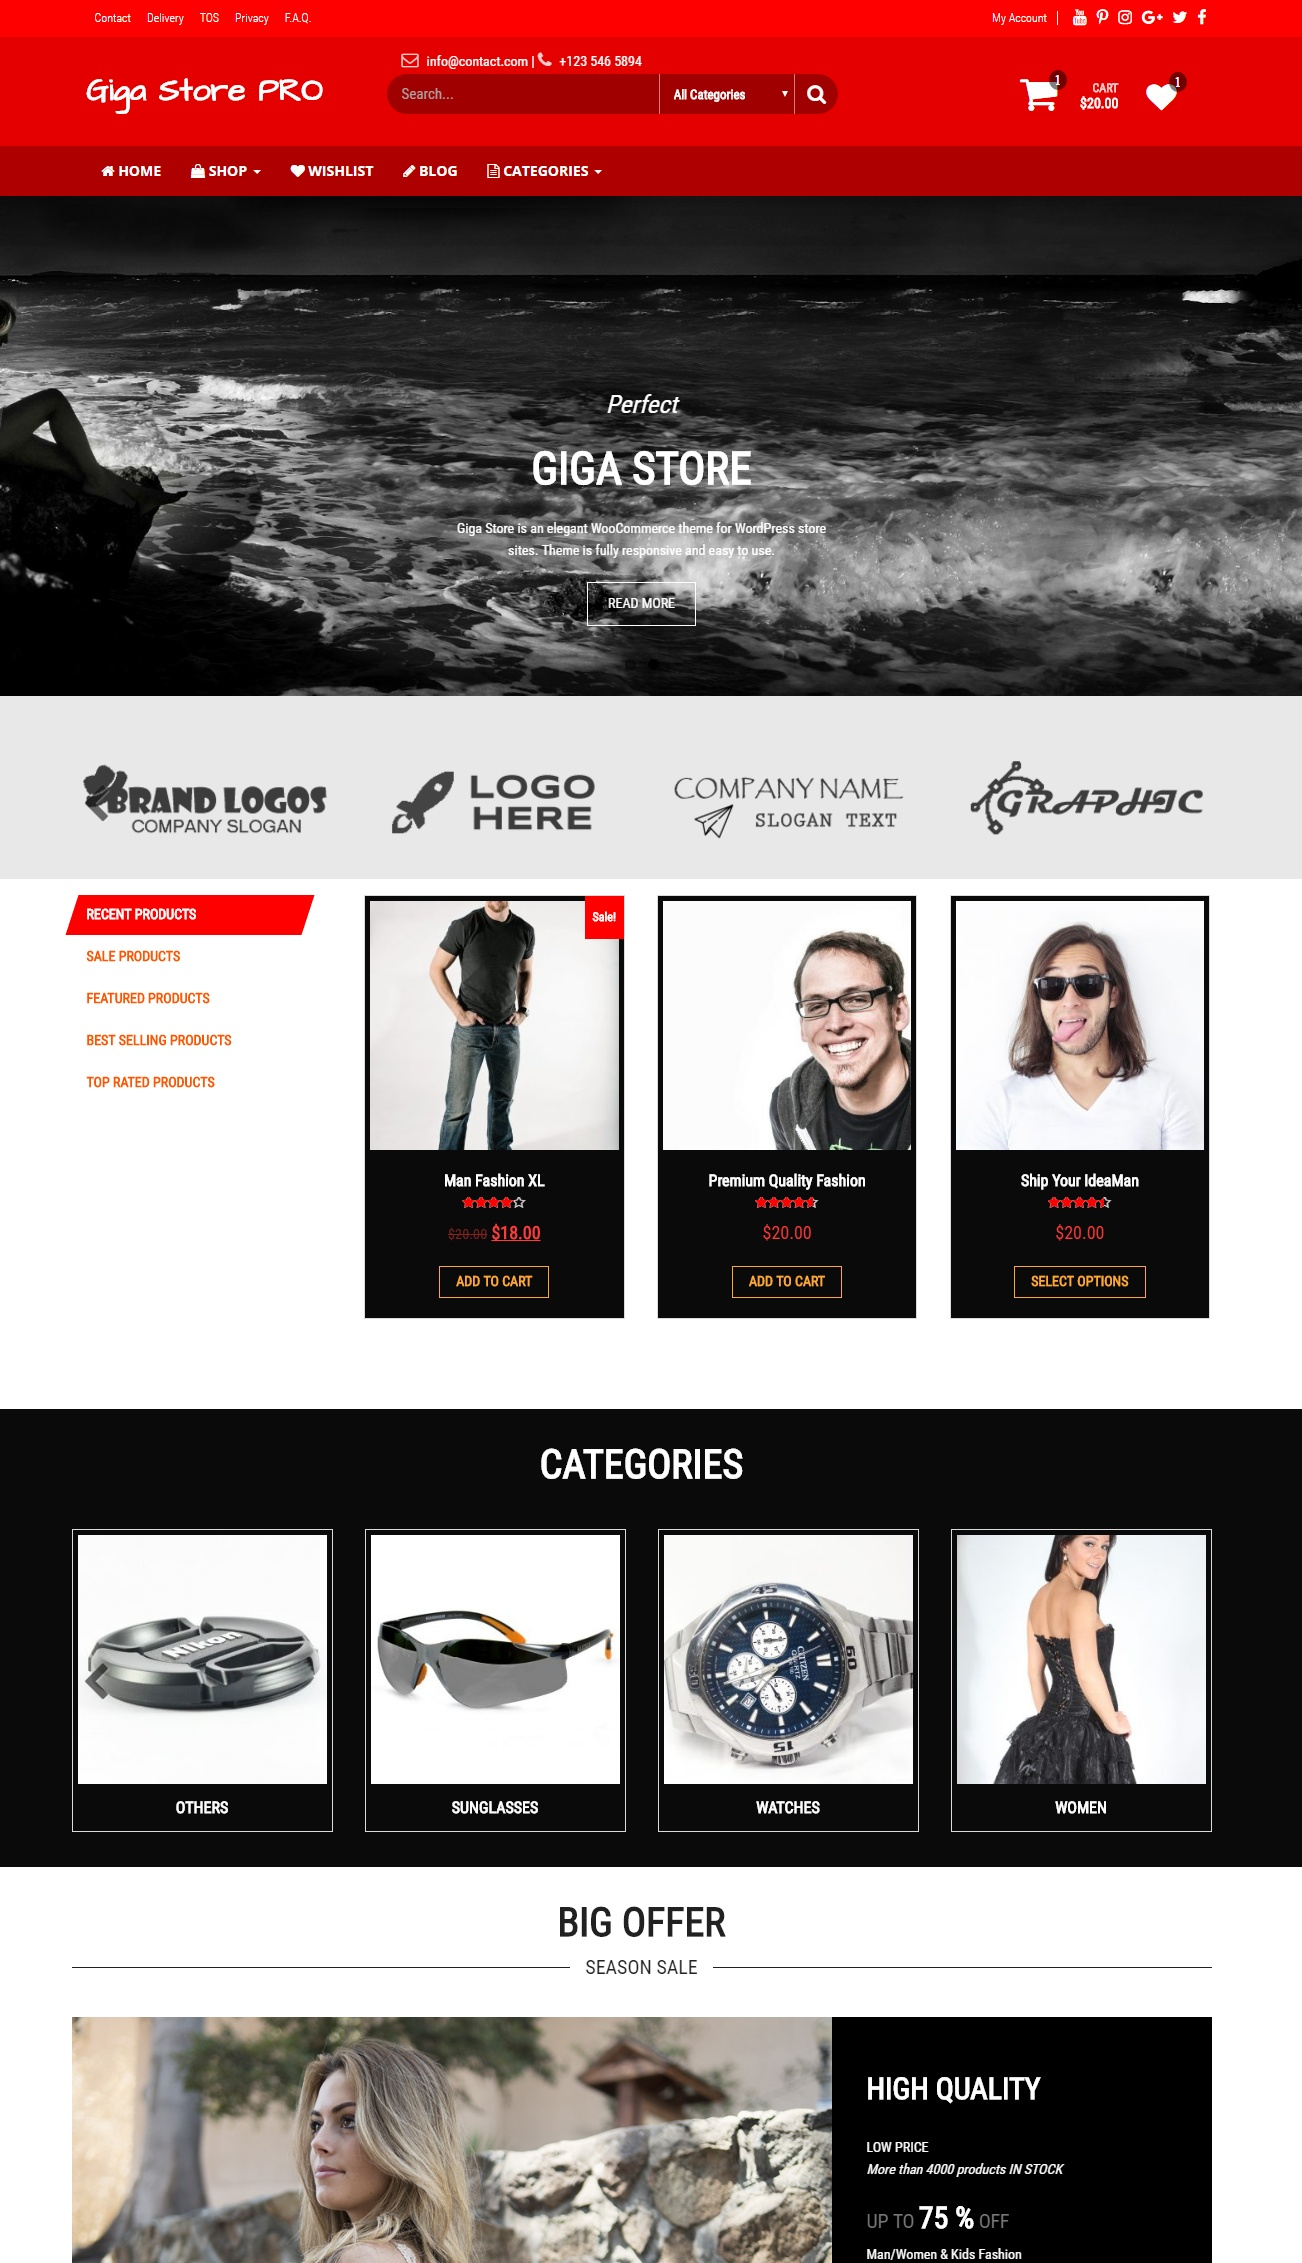 Giga Store PRO